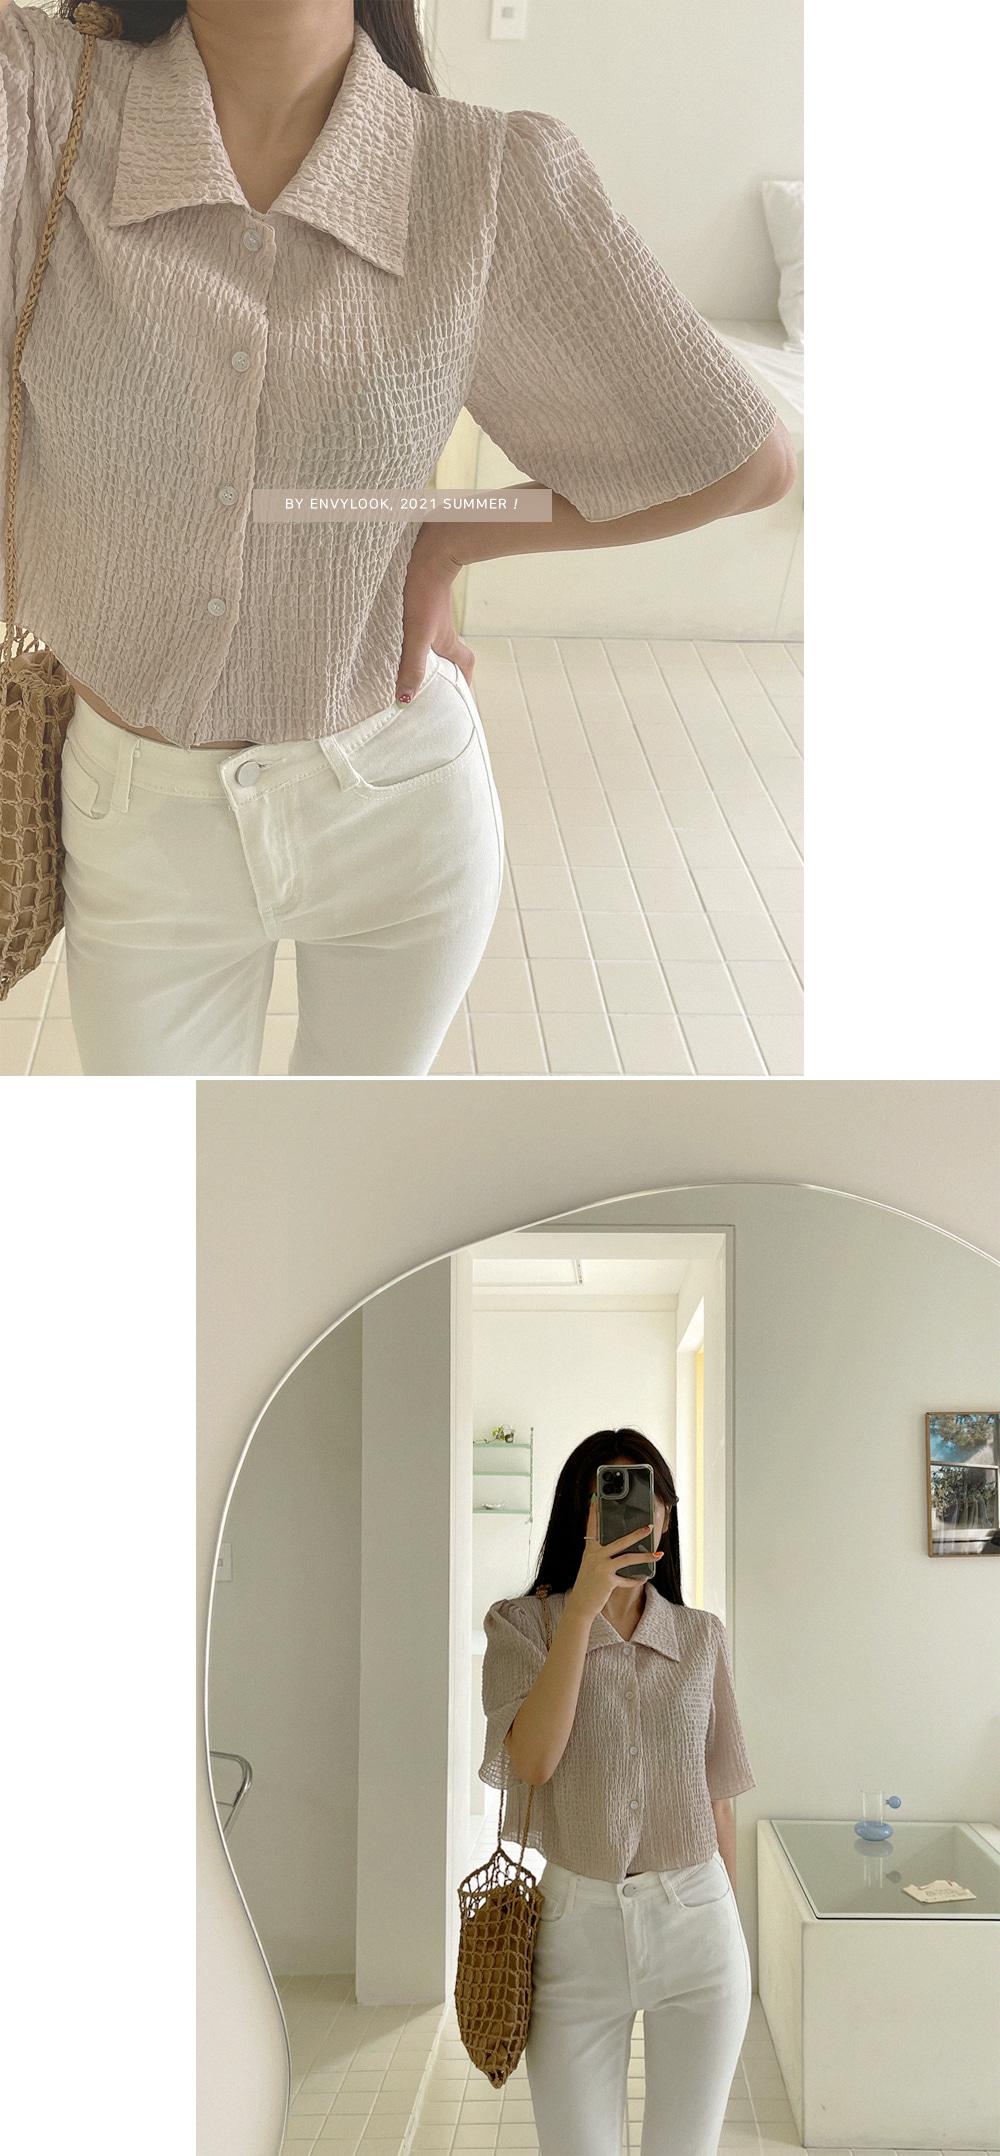 wink collar blouse